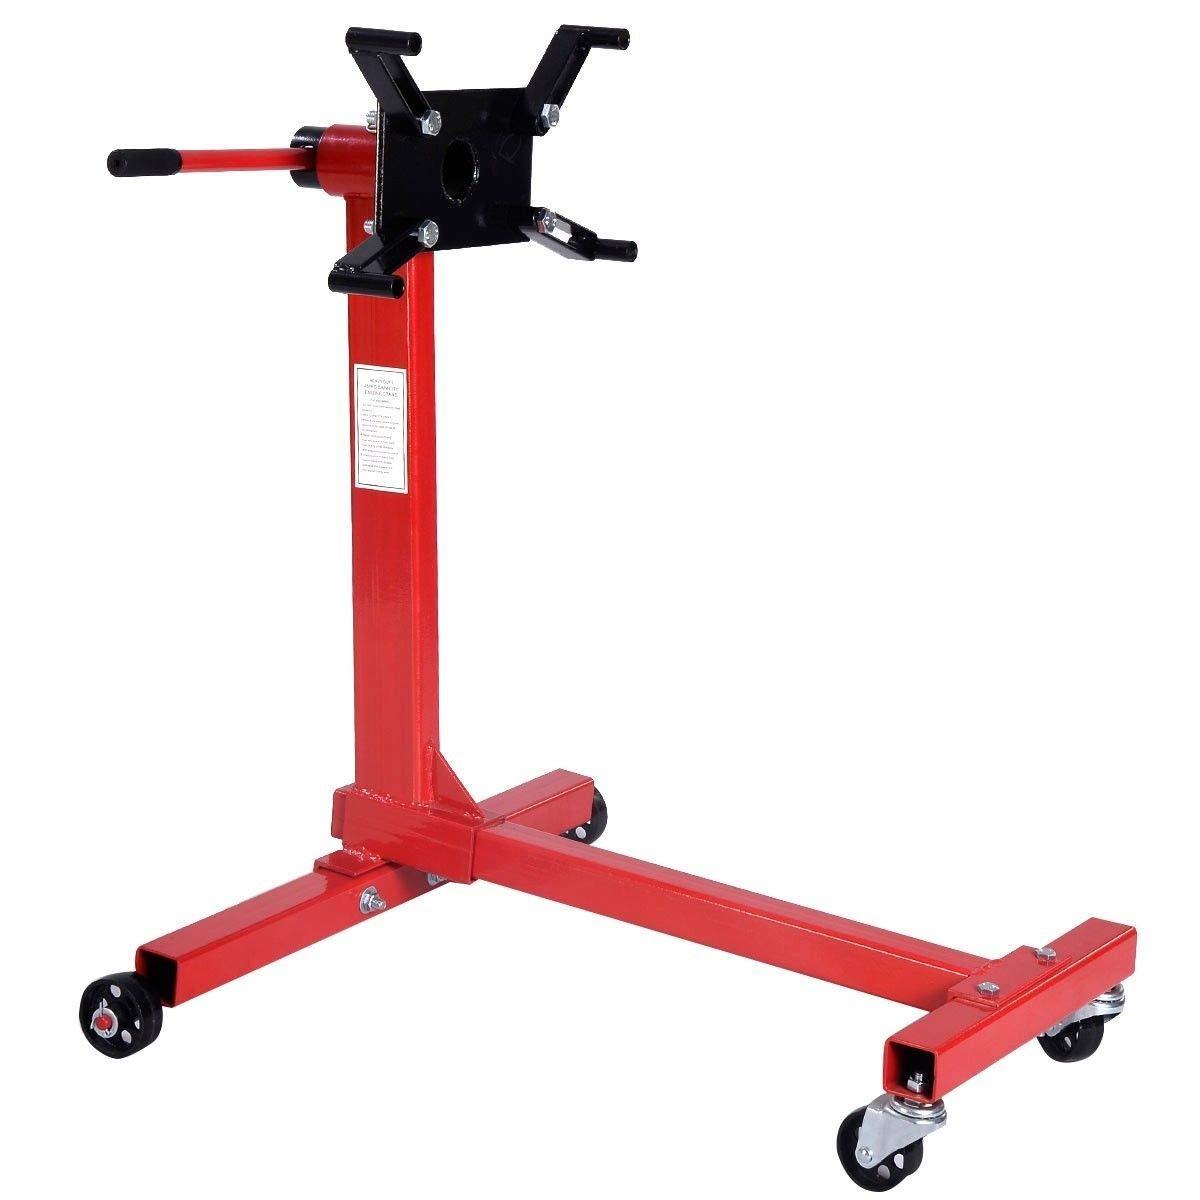 Lift Hoist Automotive 1000 lbs Rotating Shop Engine Stand Heavy Duty w/ 4 Adjustable Arms MD Group